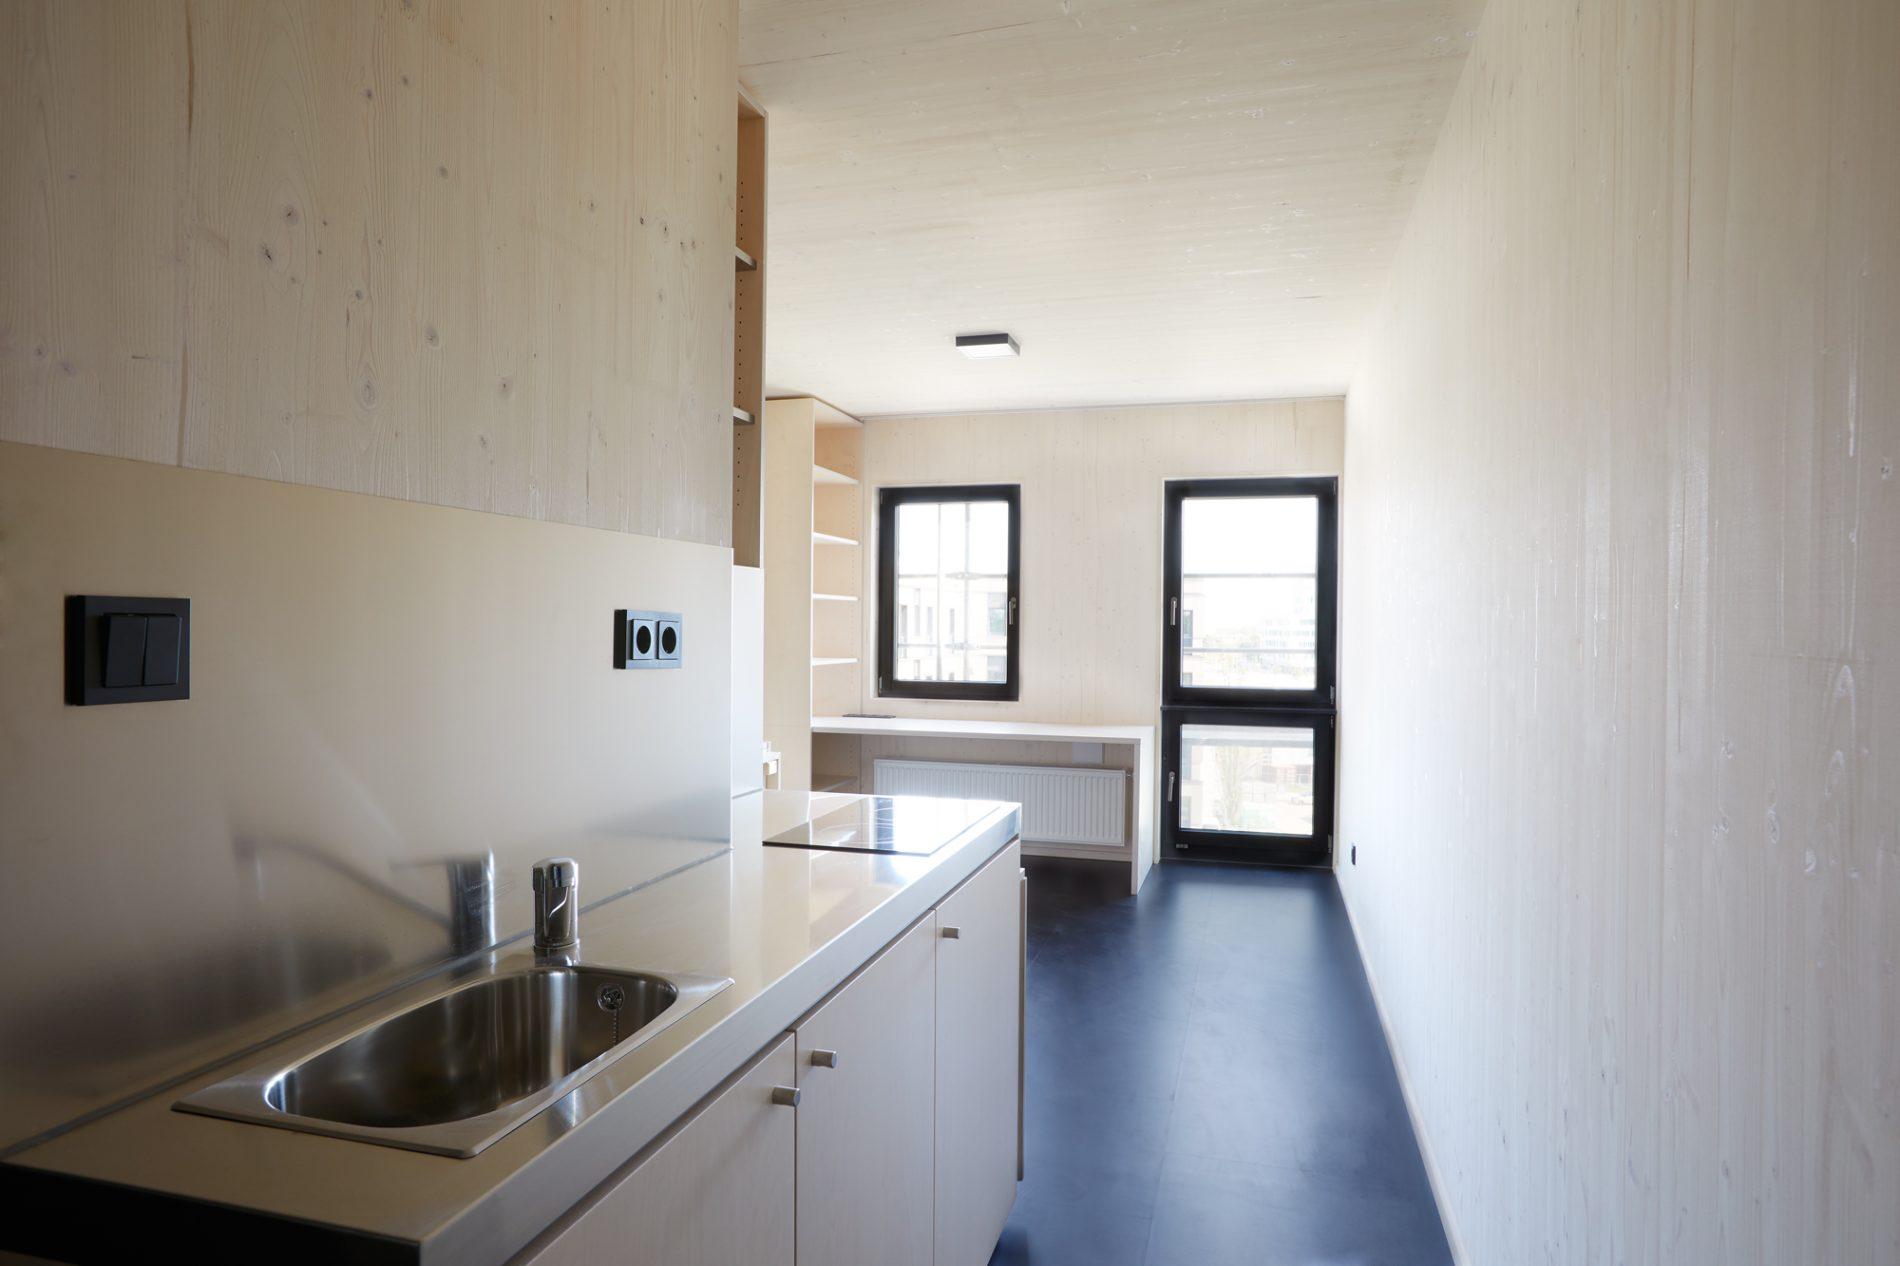 universal design quartier woodie primus developments. Black Bedroom Furniture Sets. Home Design Ideas